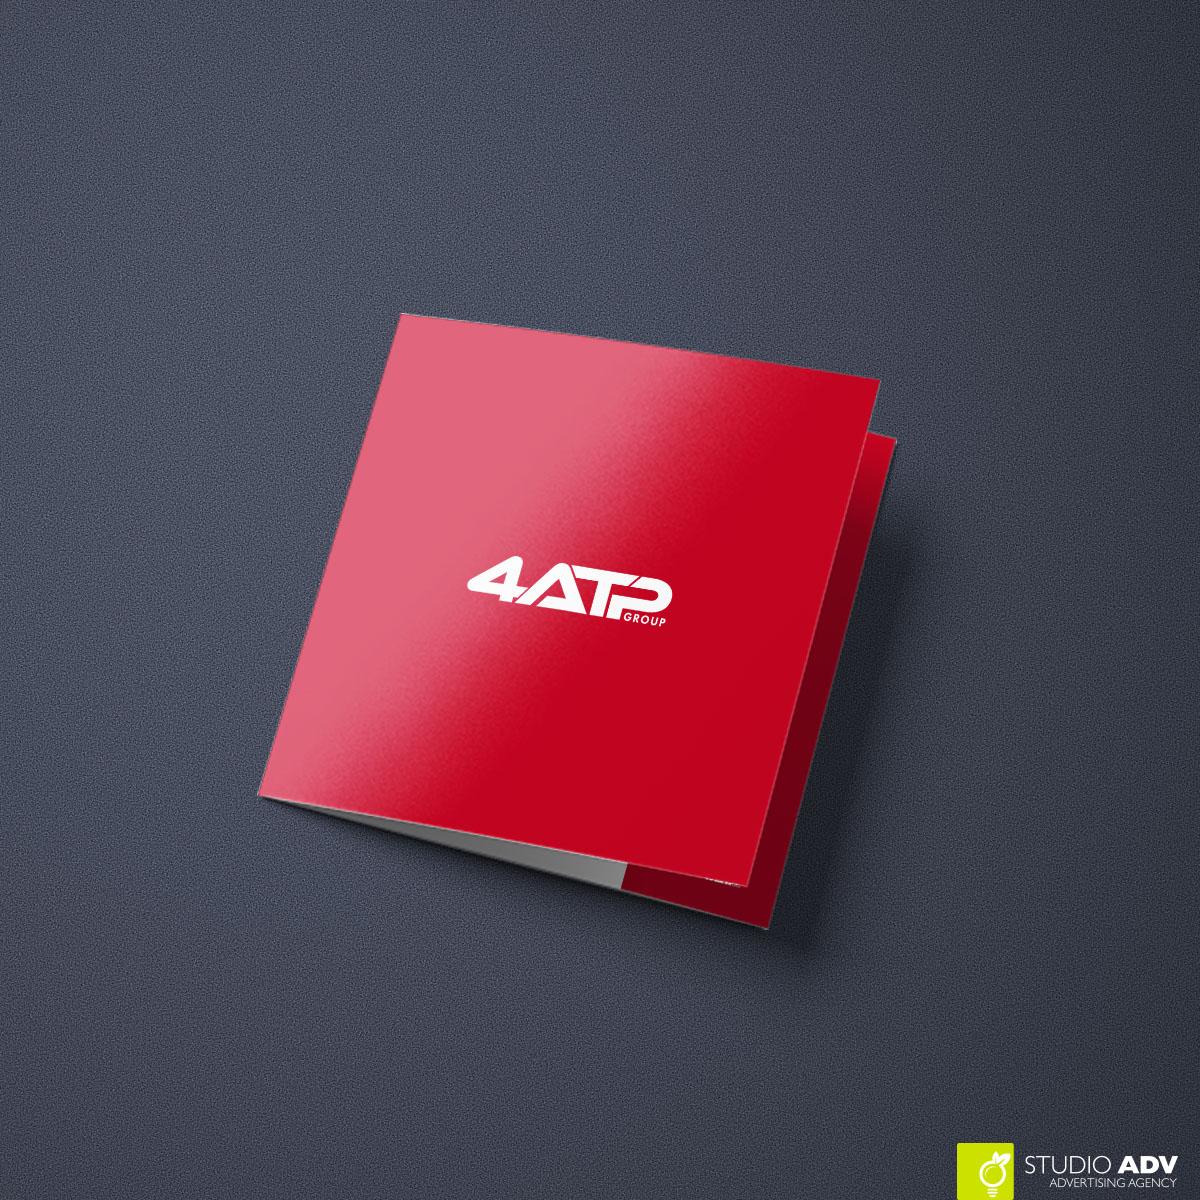 Studio ADV - 4ATP Folder